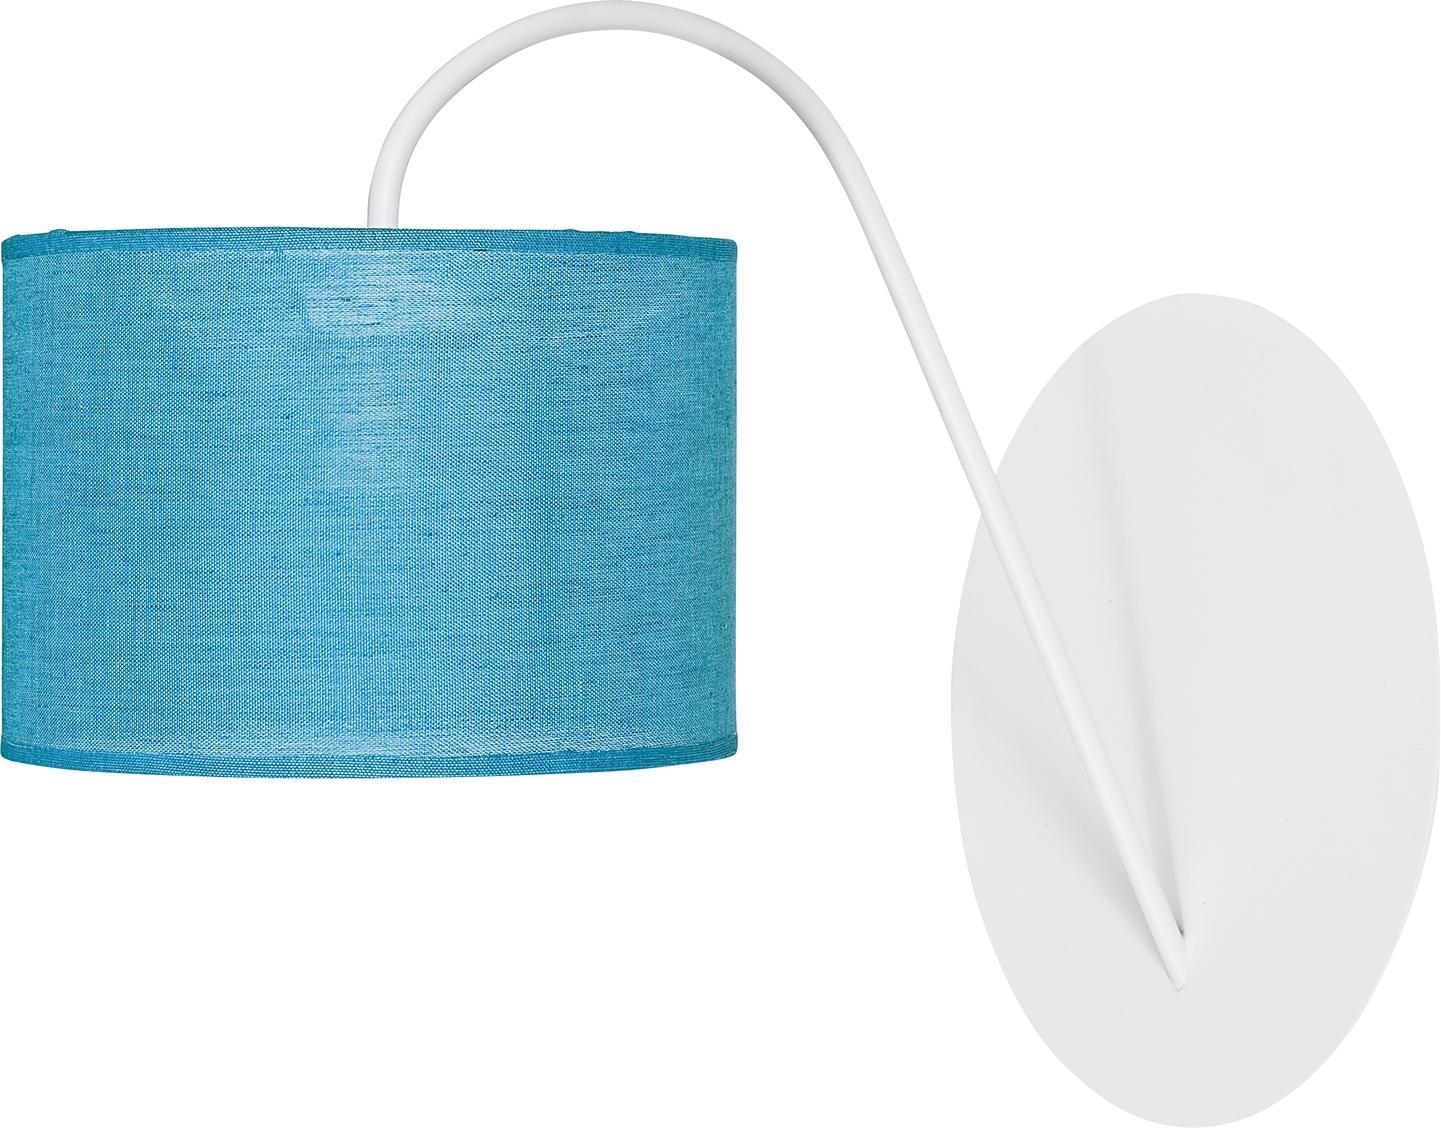 Lampy ALICE turquoise od Nowodvorski Lighting